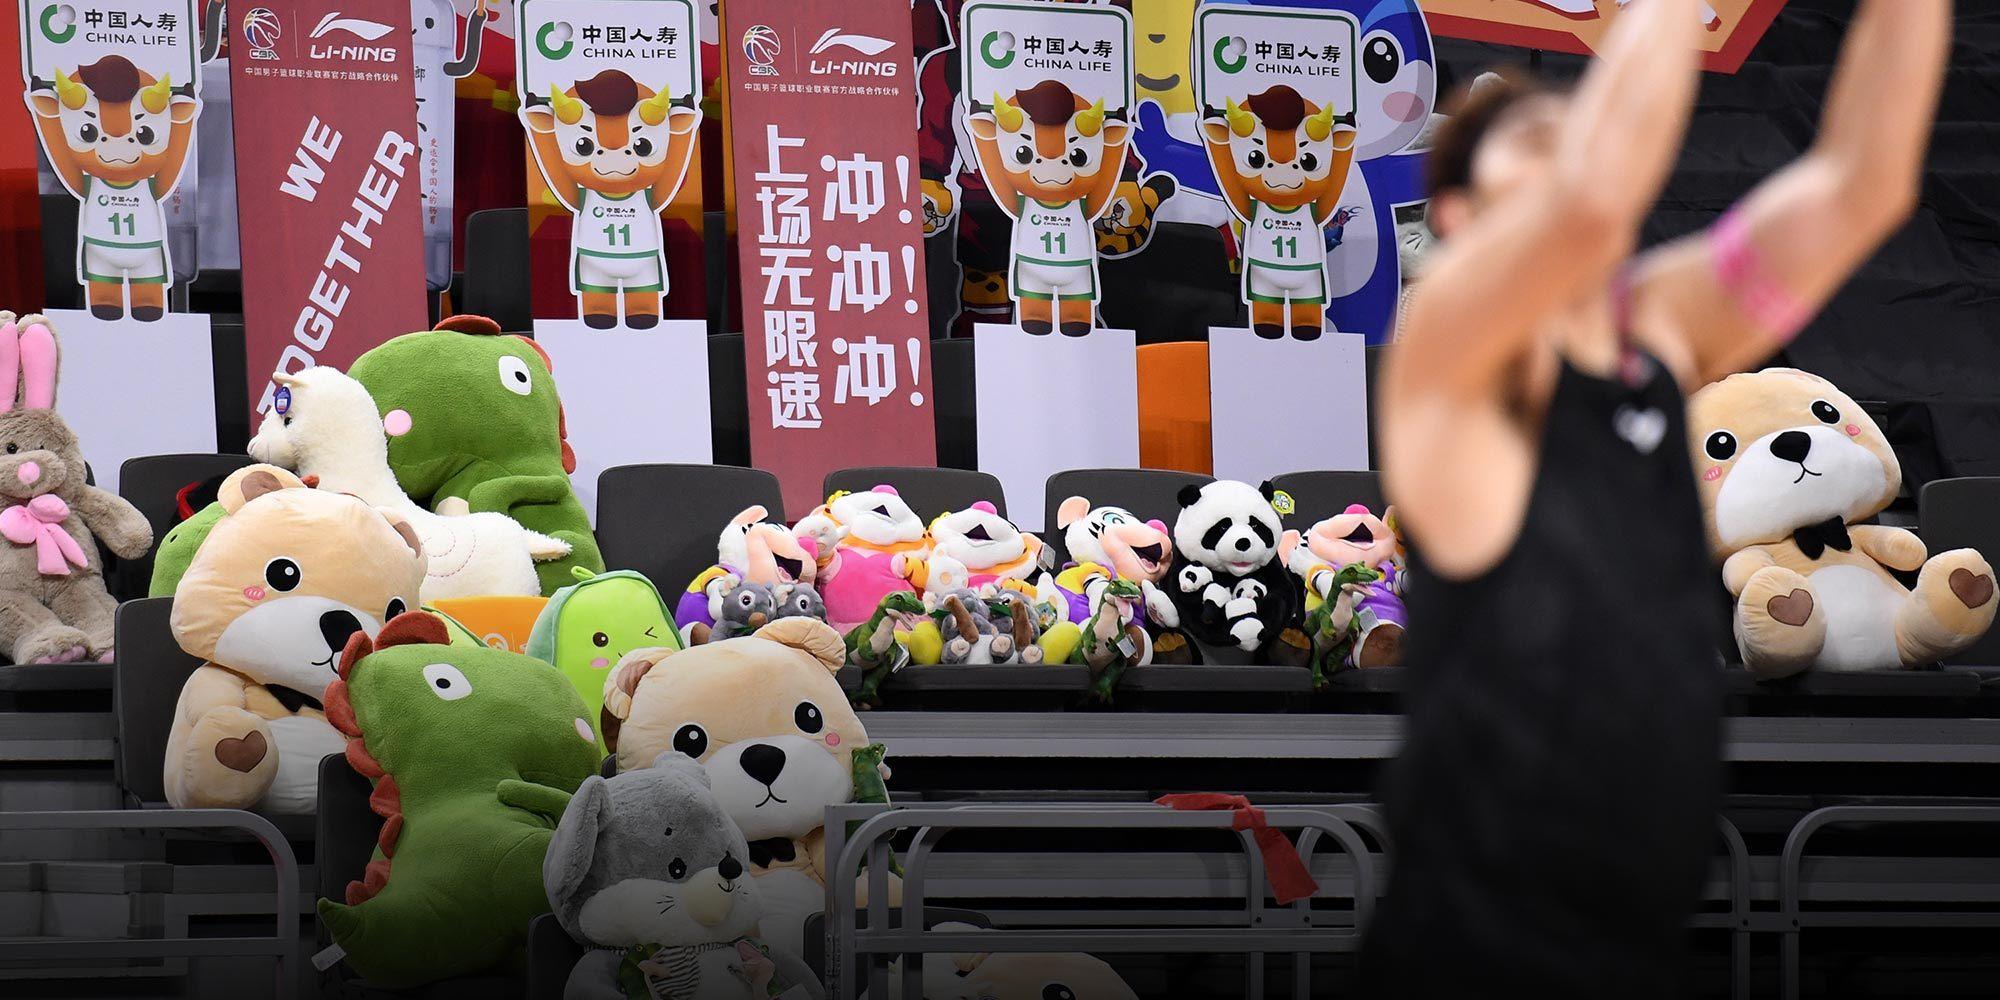 Chinese Basketball League Resumes Season After 5-Month Hiatus